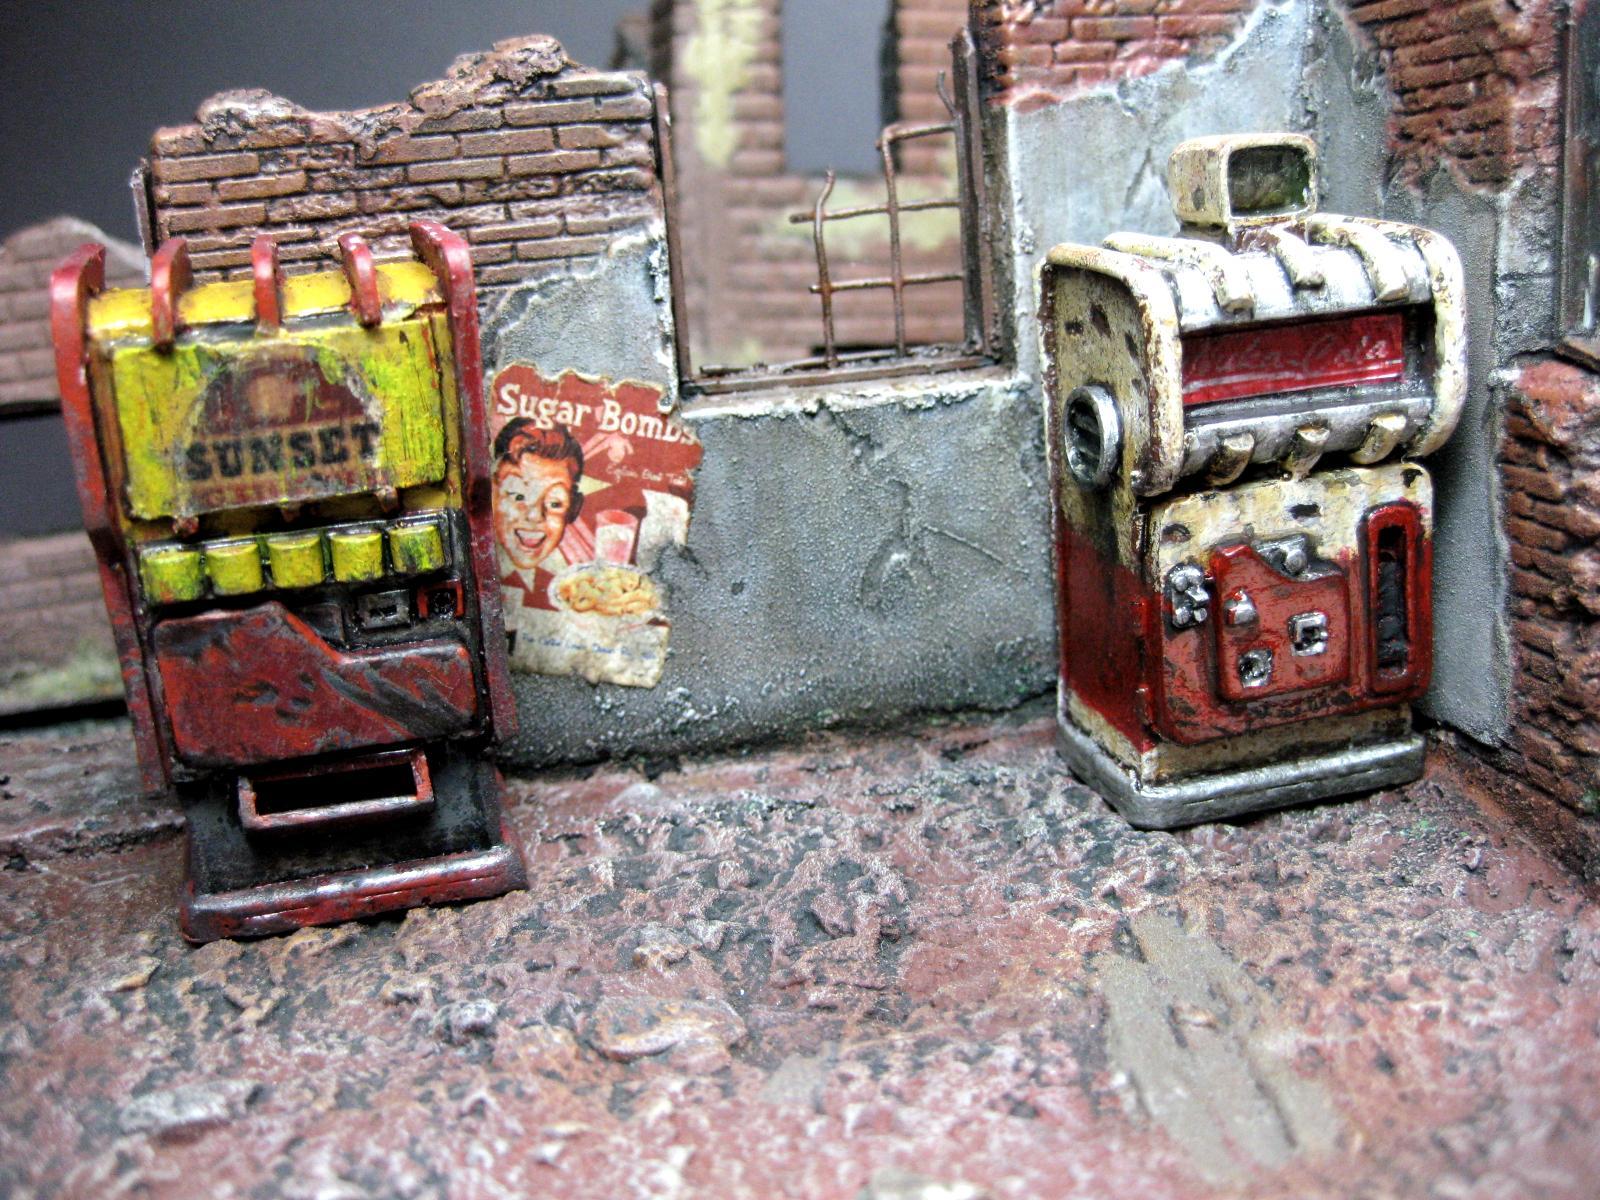 Fallout, Nuka Cola, Sunset Sarsparilla, Terrain, Vault, Vending Machine, Veninding Machine